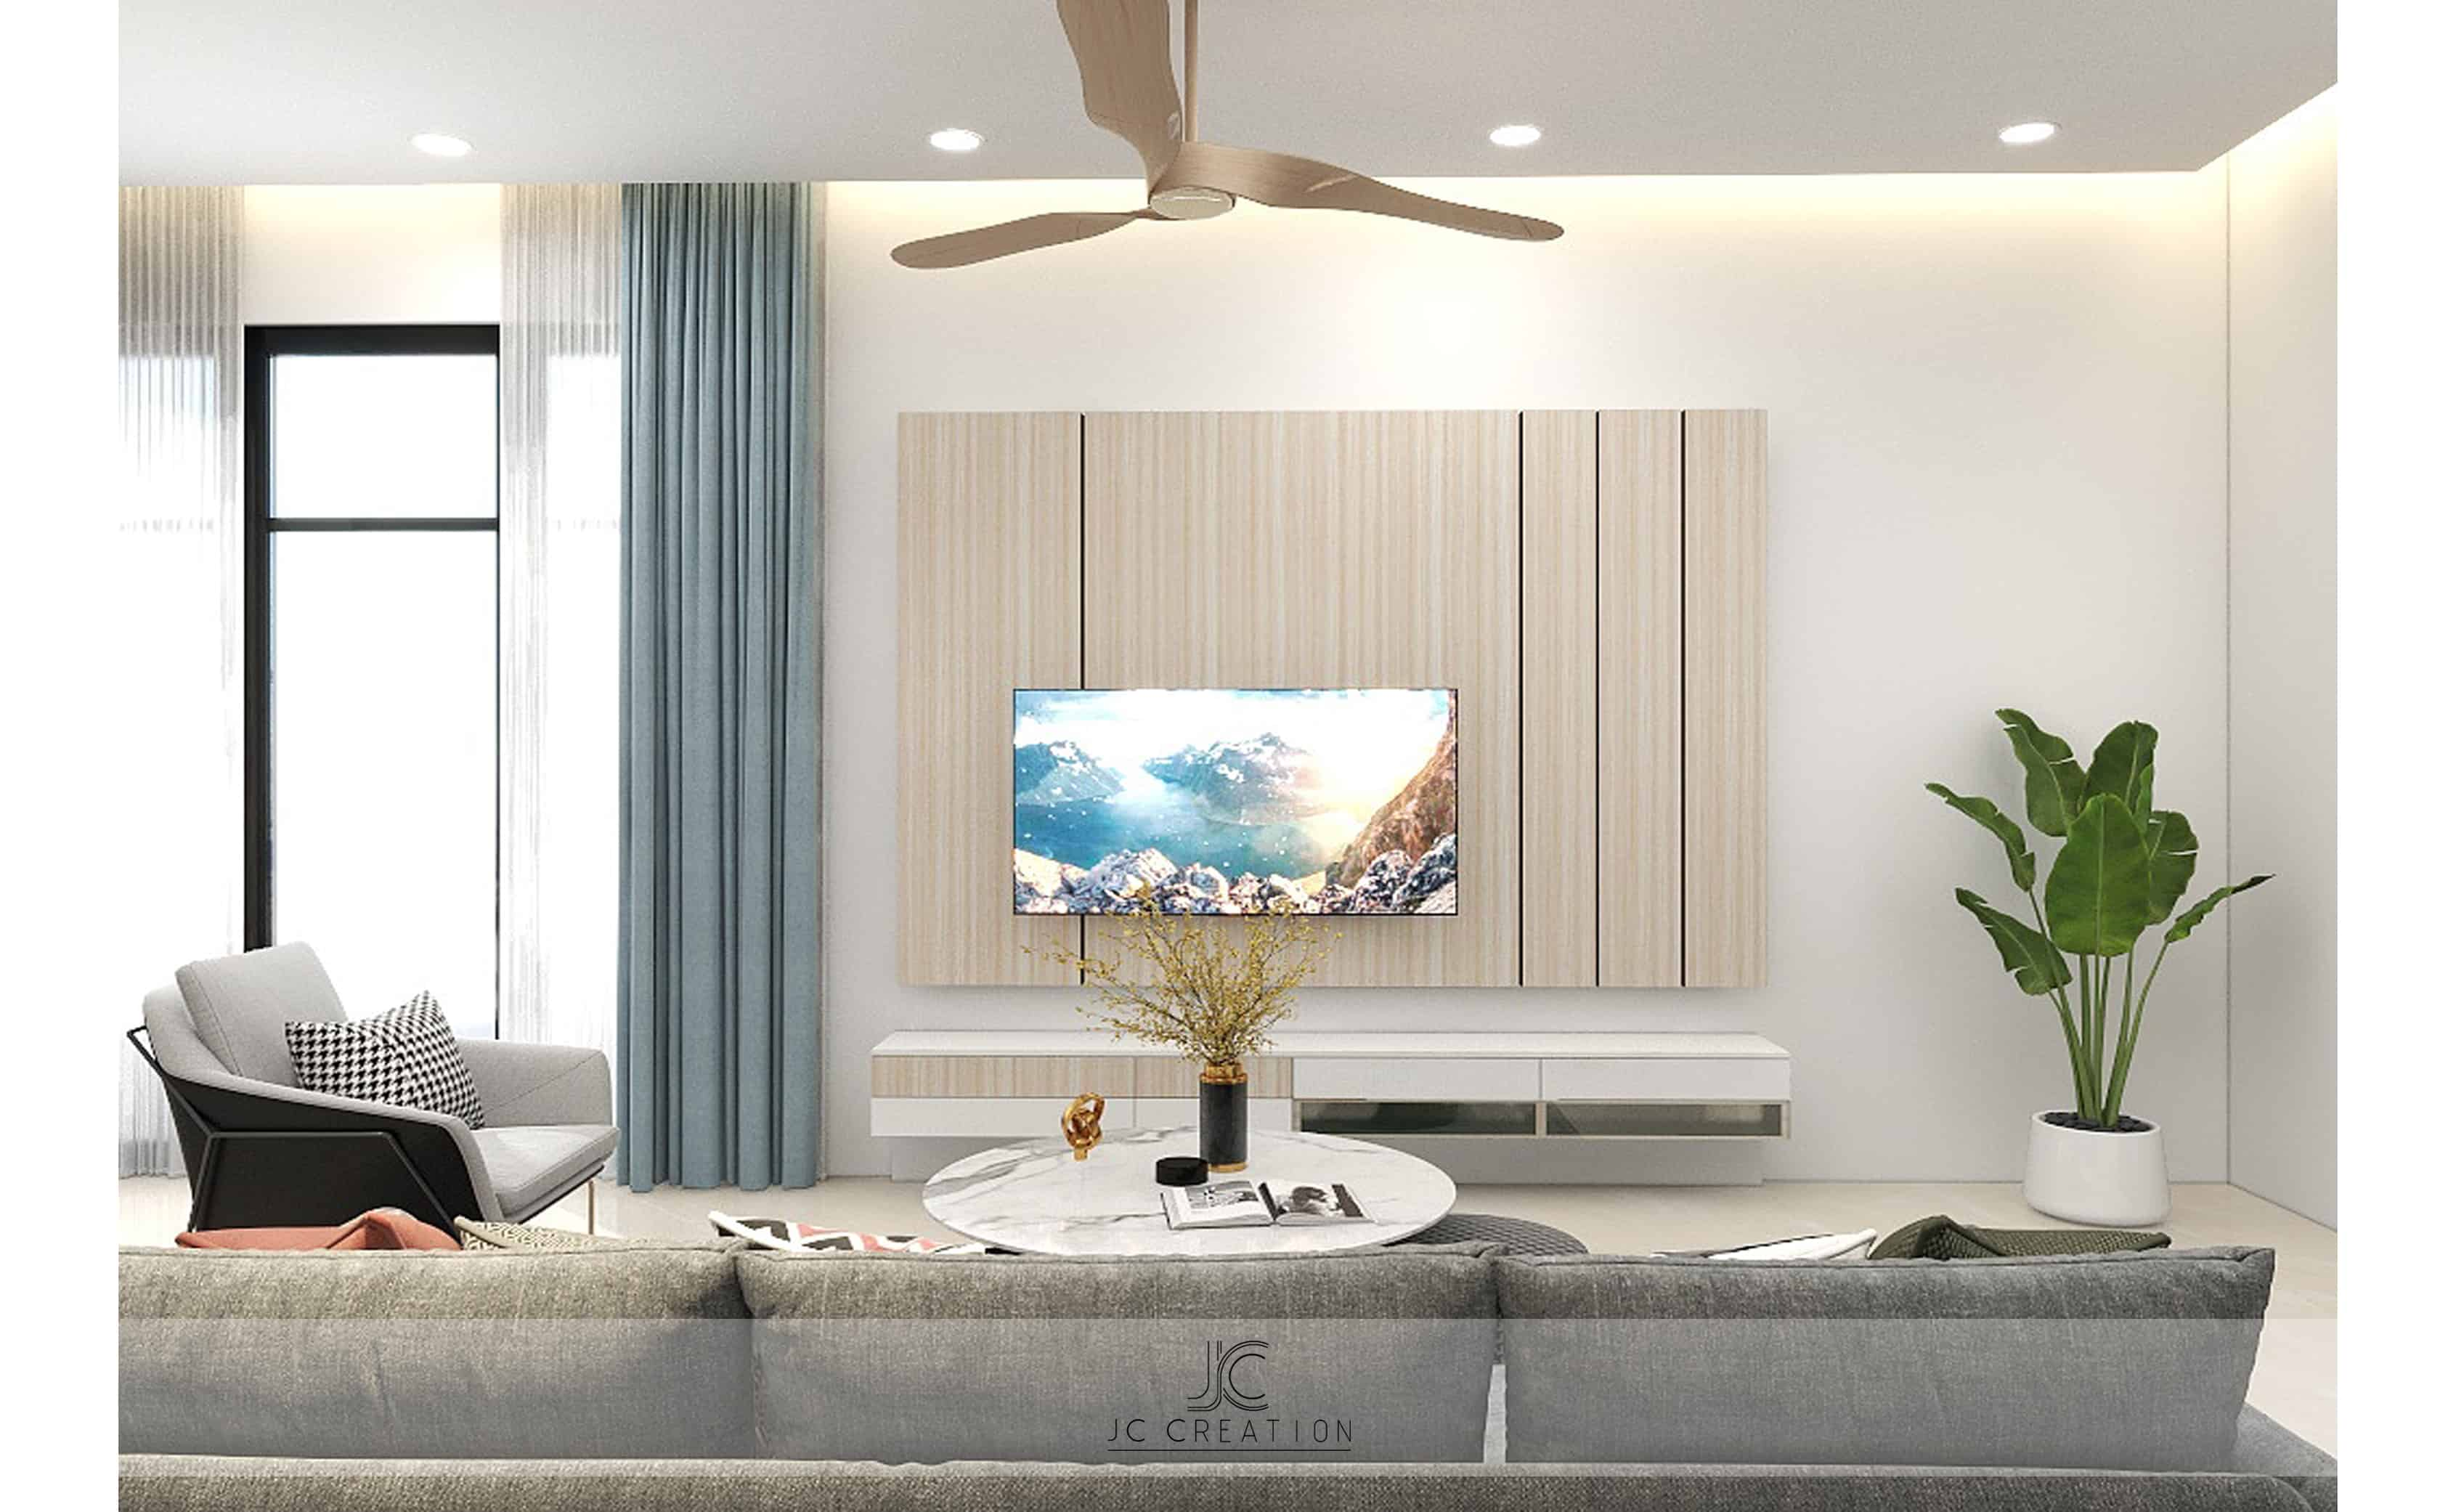 10 Innovative Ideas for Home Decoration and Interior Design